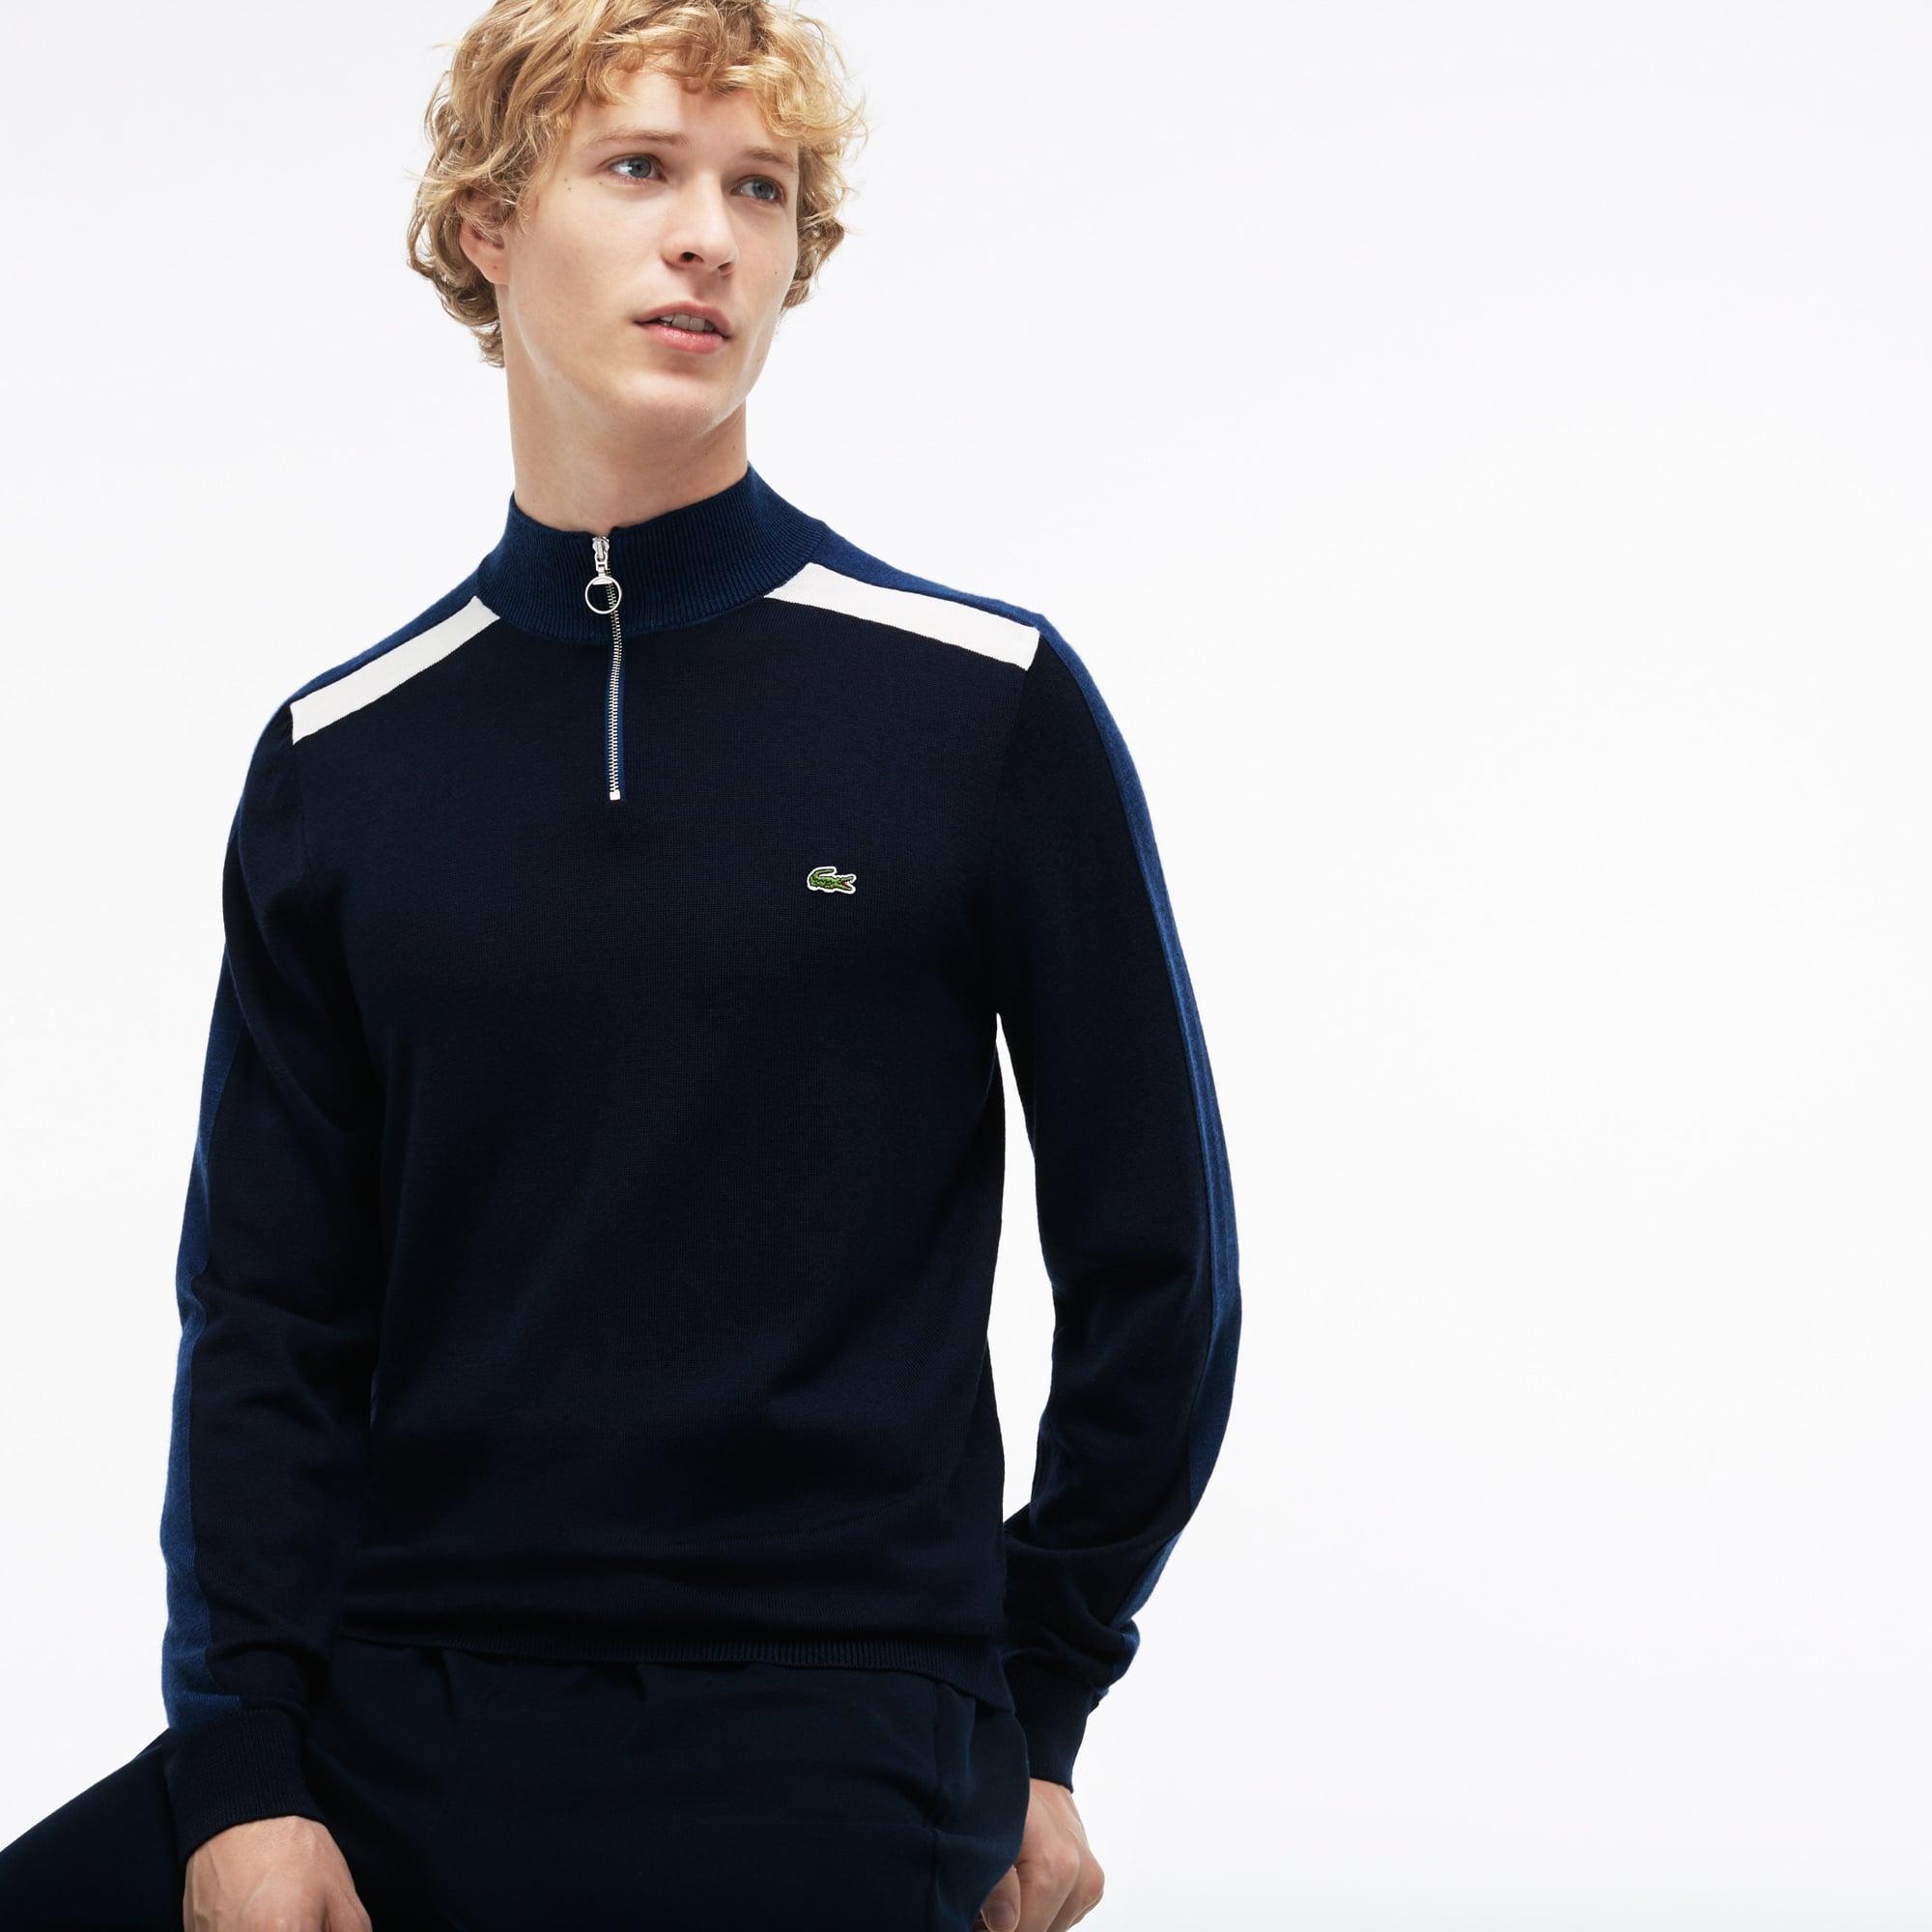 Herren-Pullover aus Jersey mit Colorblocks MADE IN FRANCE